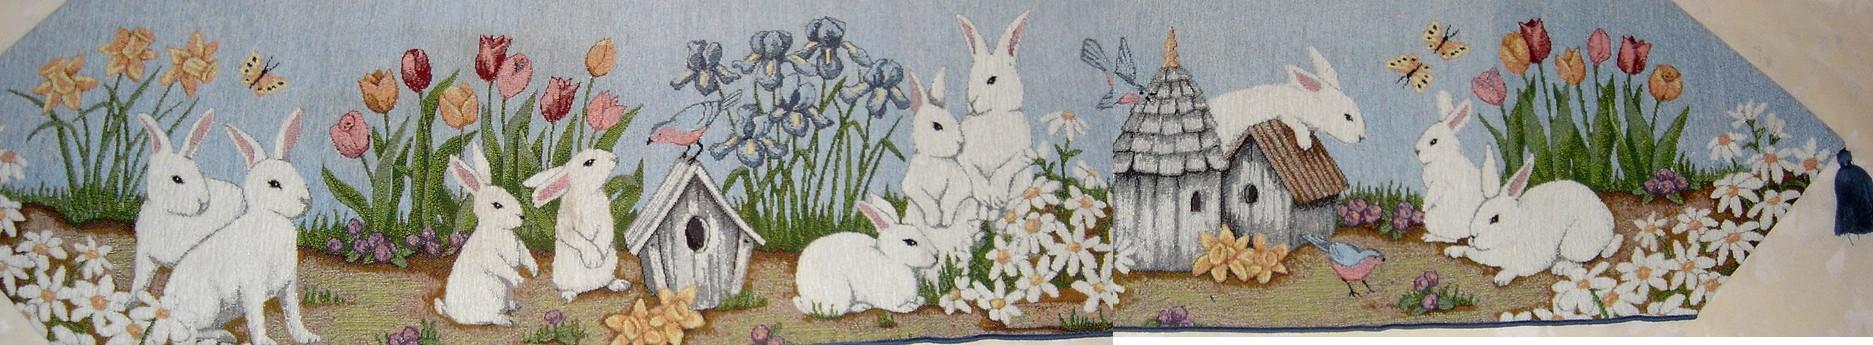 decortive ester ccents easter rabbit decor bunny.htm bunnyrabbit com  rabbit home decor  bunny home decor  bunny gift  bunnyrabbit com  rabbit home decor